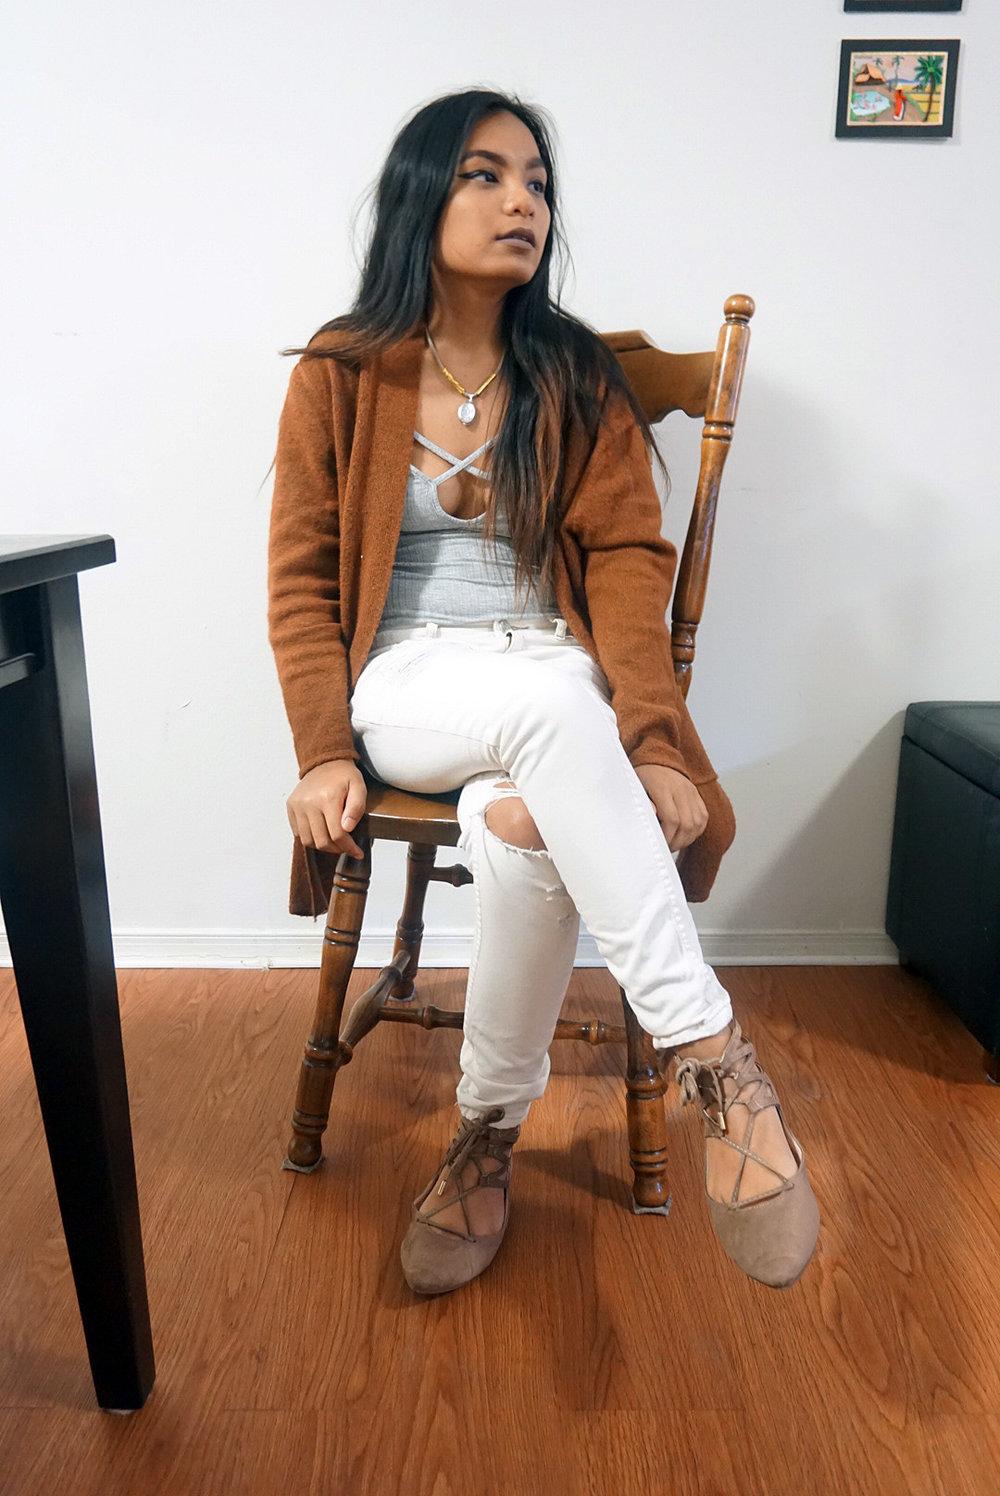 Caramel-Cardigan-Camel-Cardigan-Bodysuit-Boyfriend-Jeans-Ripped-Jeans-Blogger-Style-Casual-Look-LINDATENCHITRAN-2-1080x1616.jpg